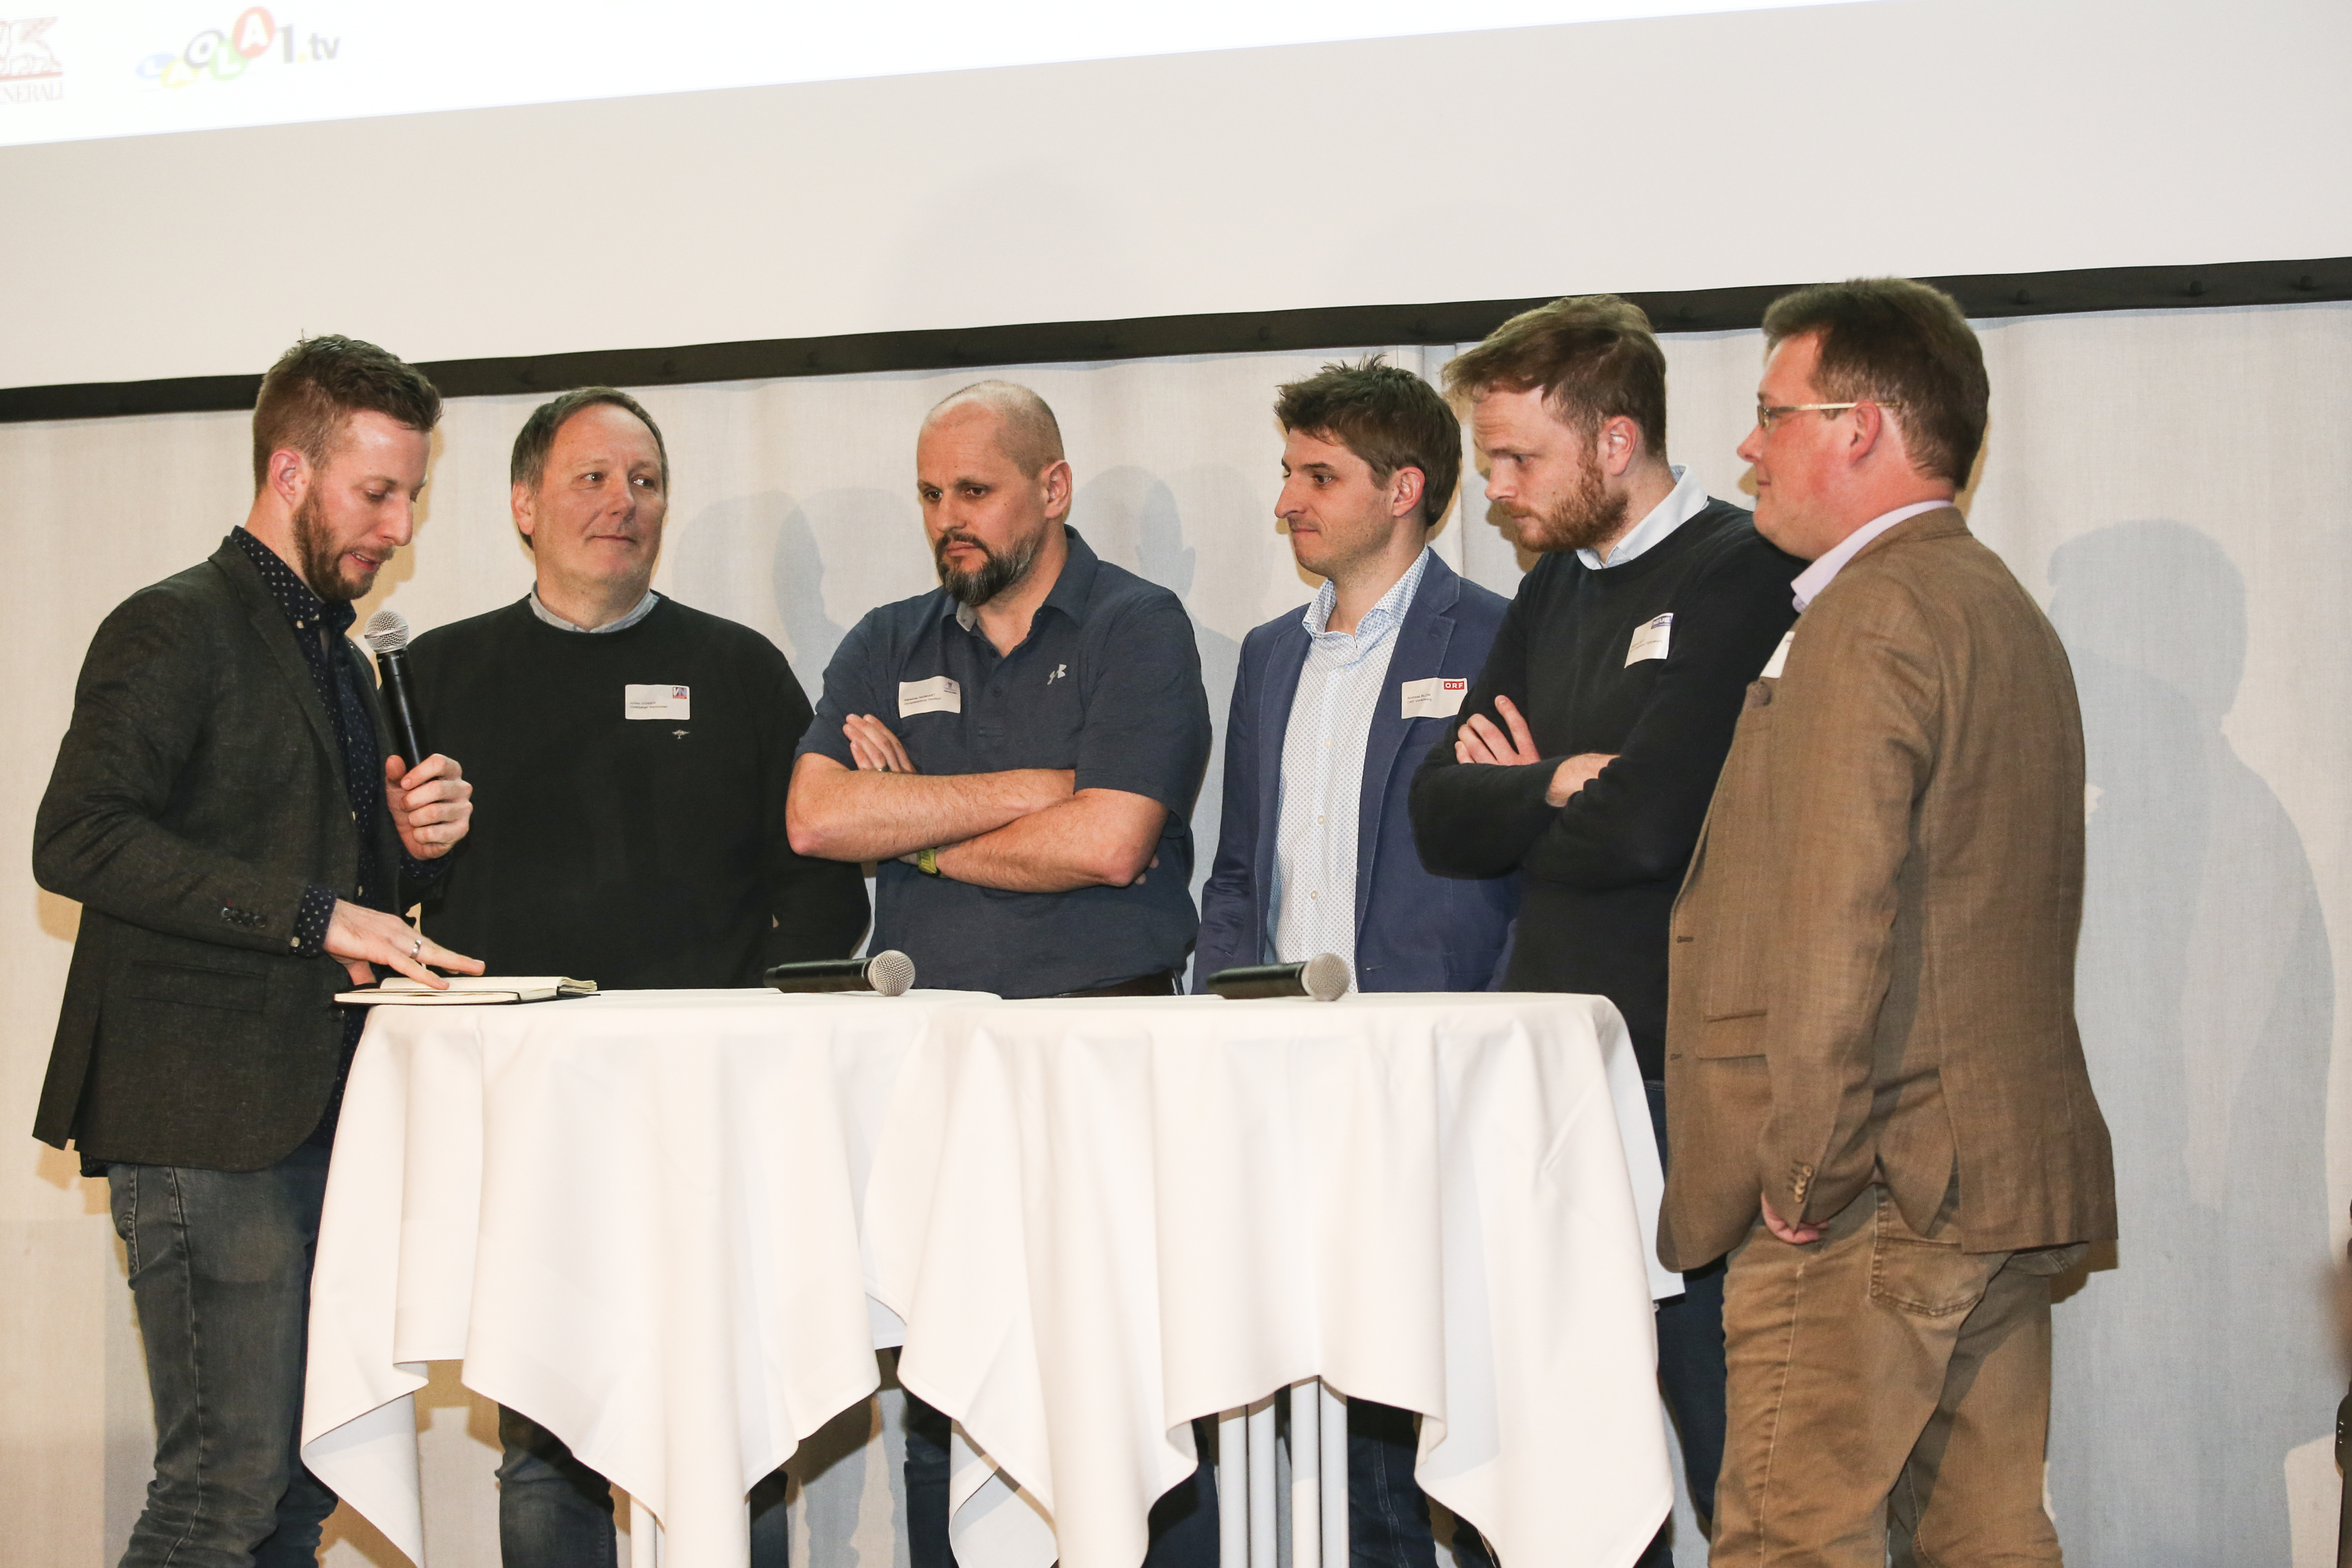 spusu HLA Branchentreff 3.0. in Vorarlberg mit cinnamon Hospitatlity & Promotion - Fotocredit: Alexandra Köss